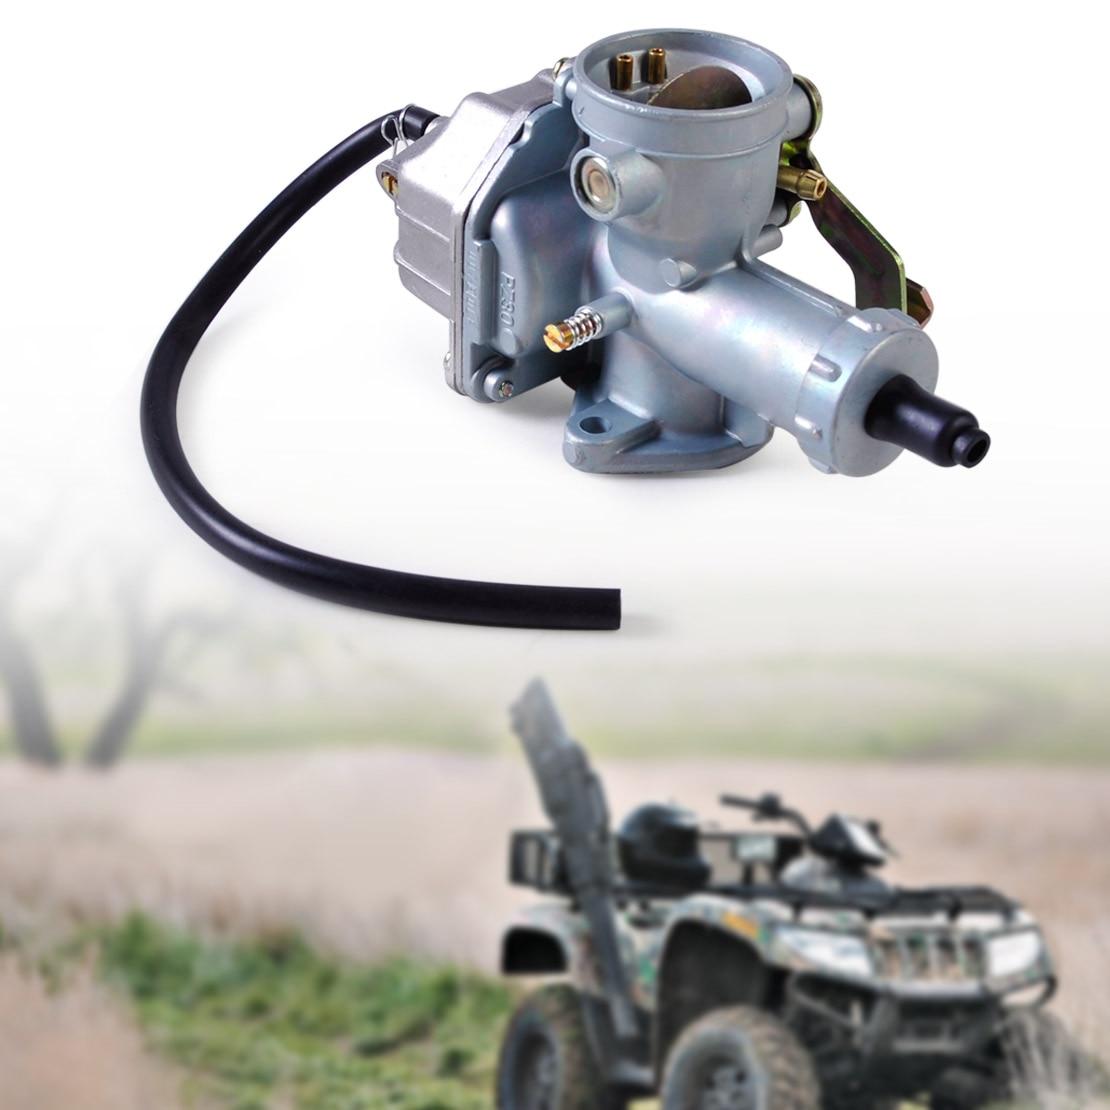 DWCX Carburetor PZ30 Carb Cable Choke for 200cc 250cc ATV Quad 4 Wheeler Dirt Bike Pit Bike Dirt Bikes & Go Karts